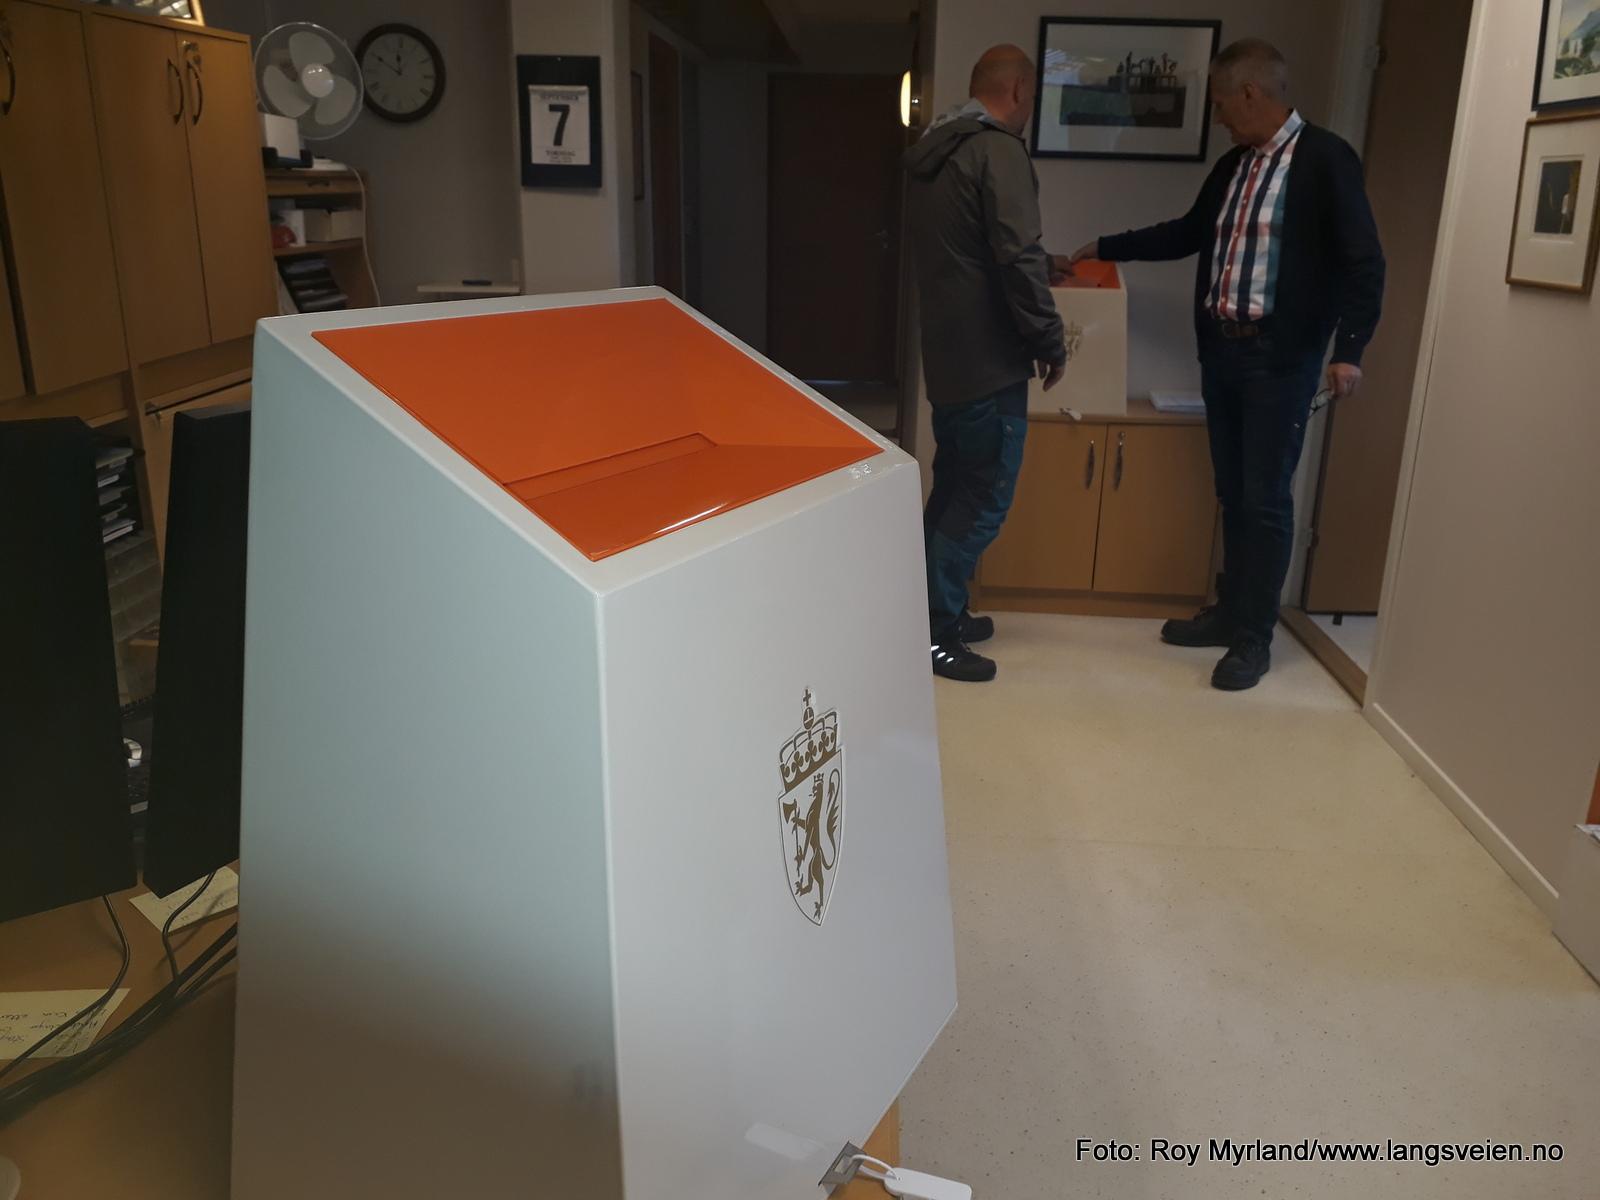 Valgurne Stortingsvalget 2017.